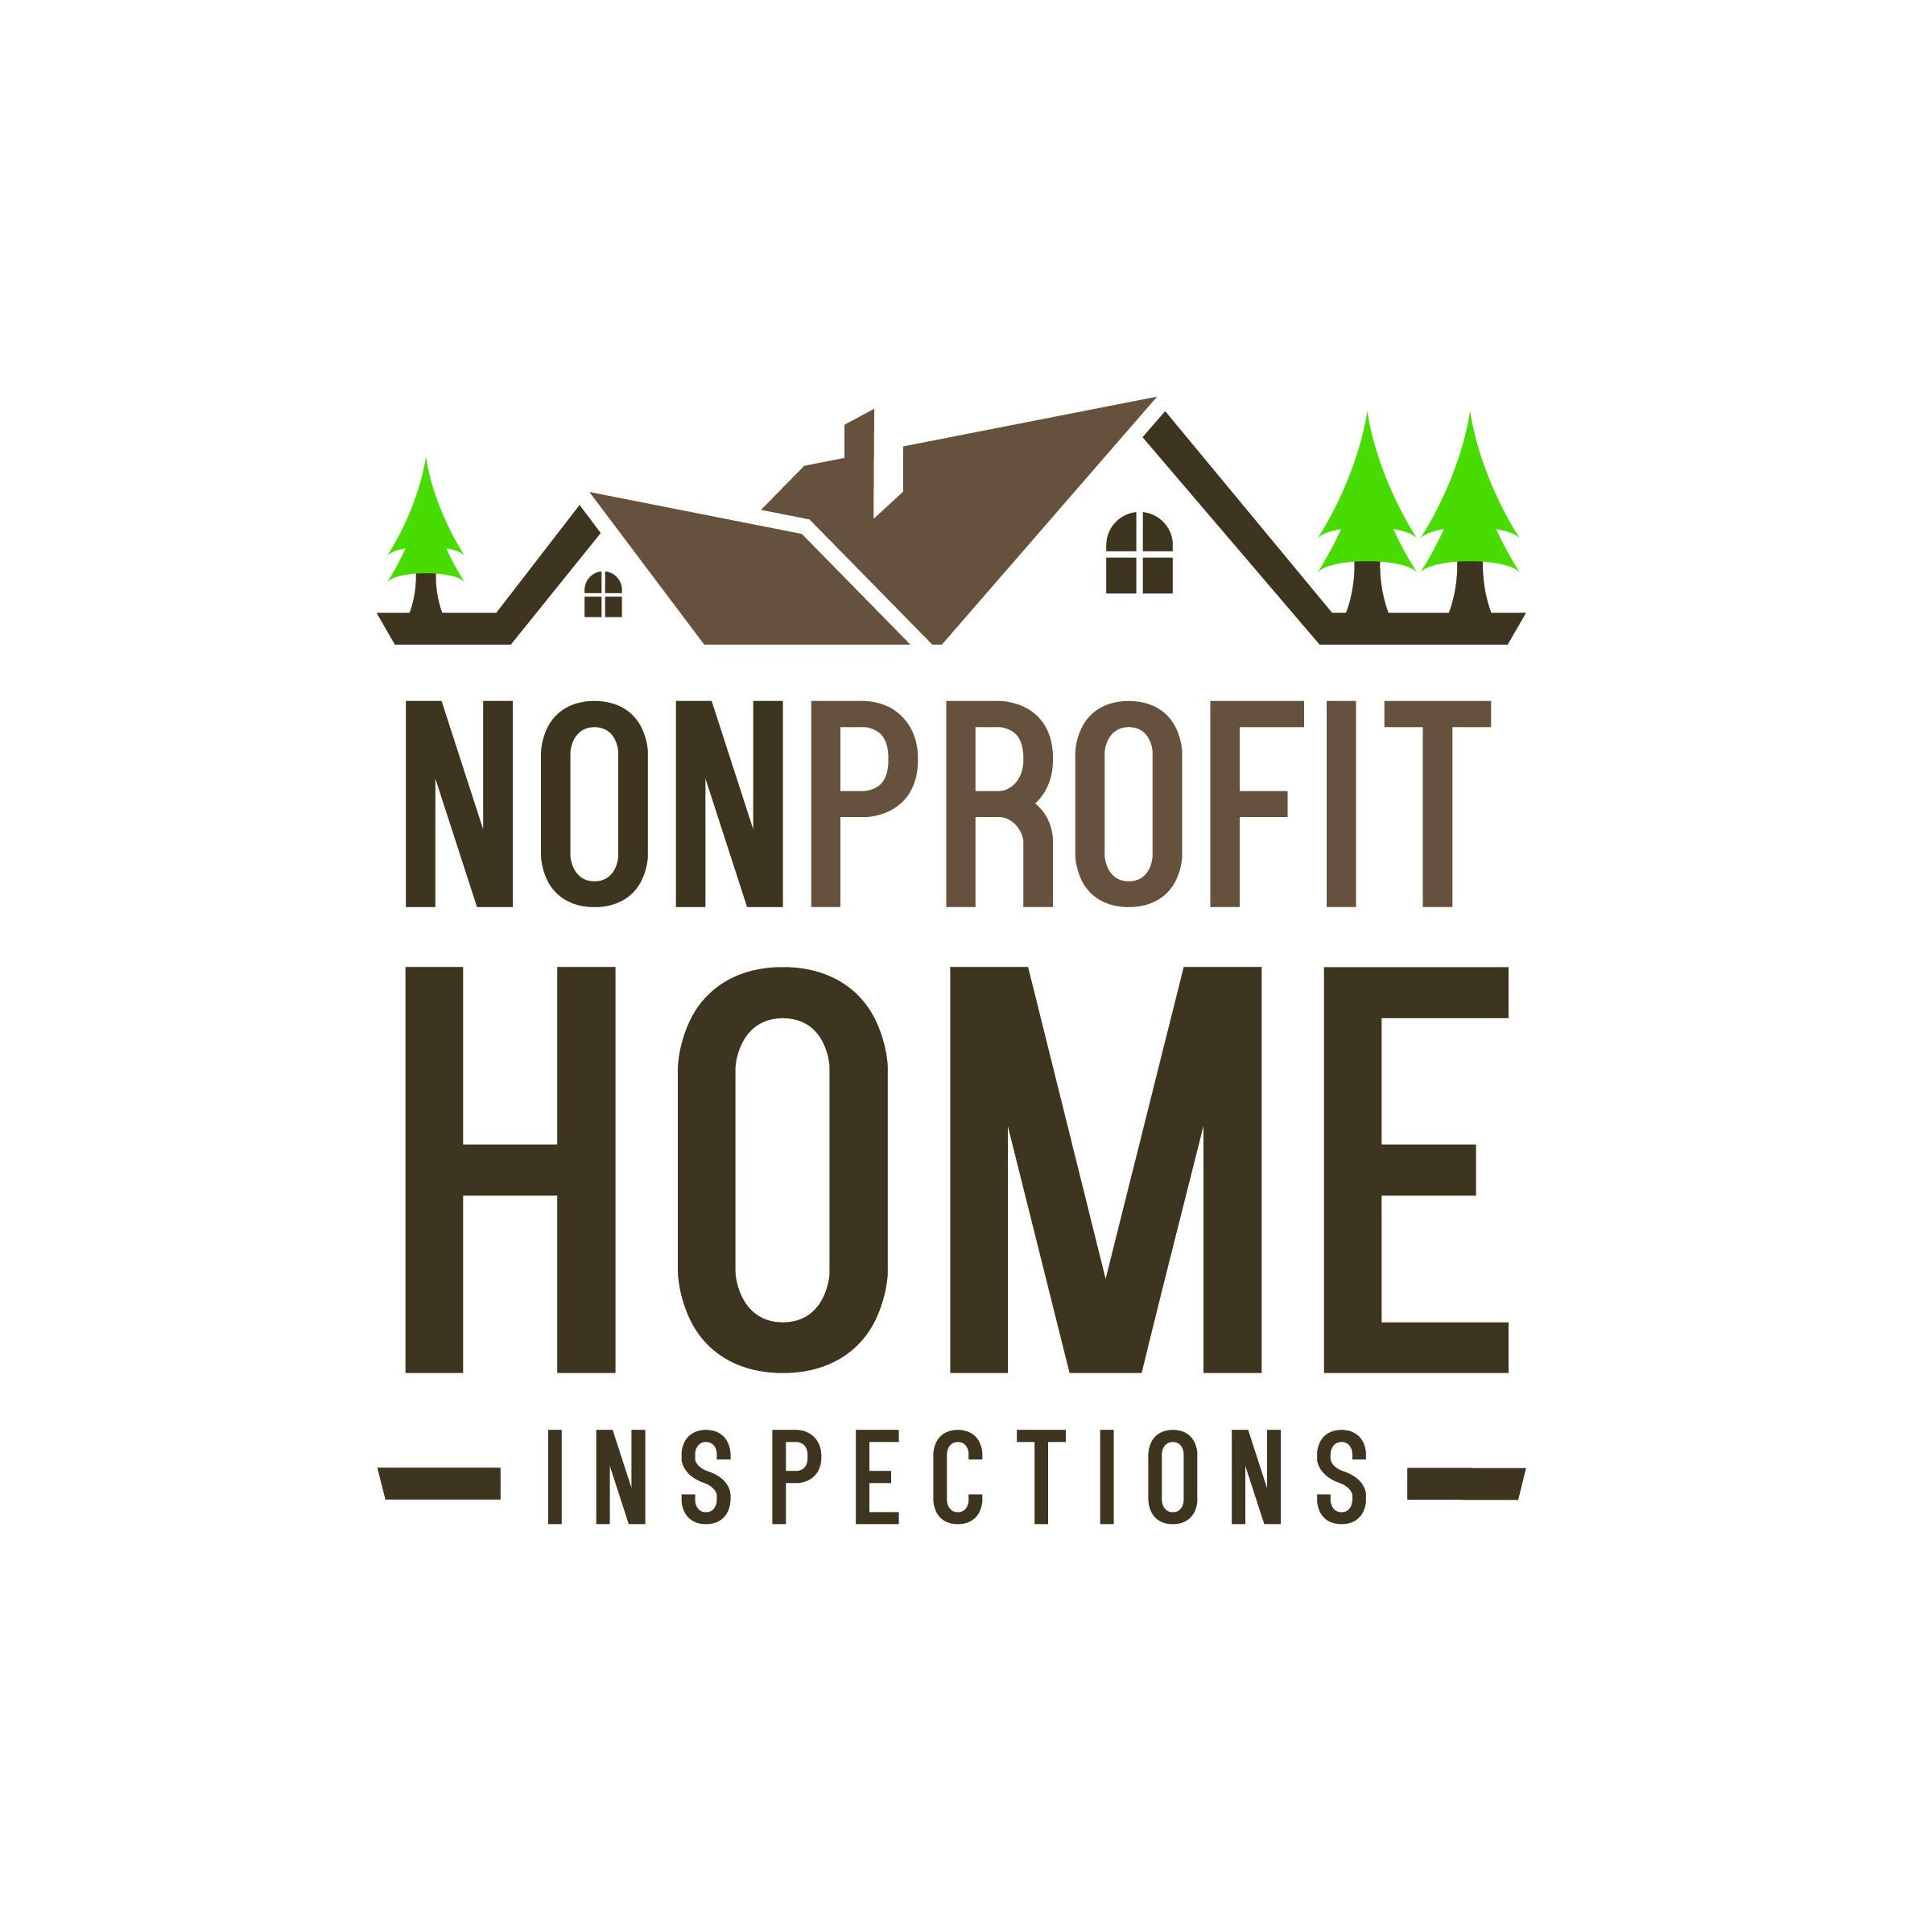 Nonprofit Home Inspections Logo